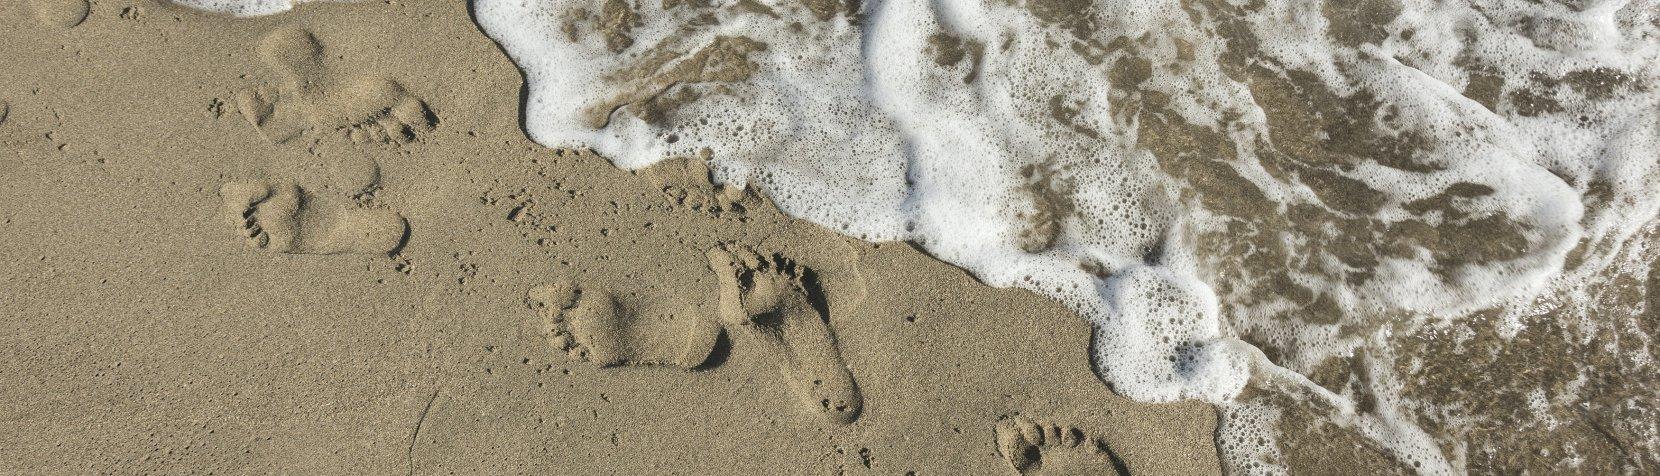 fodaftryk